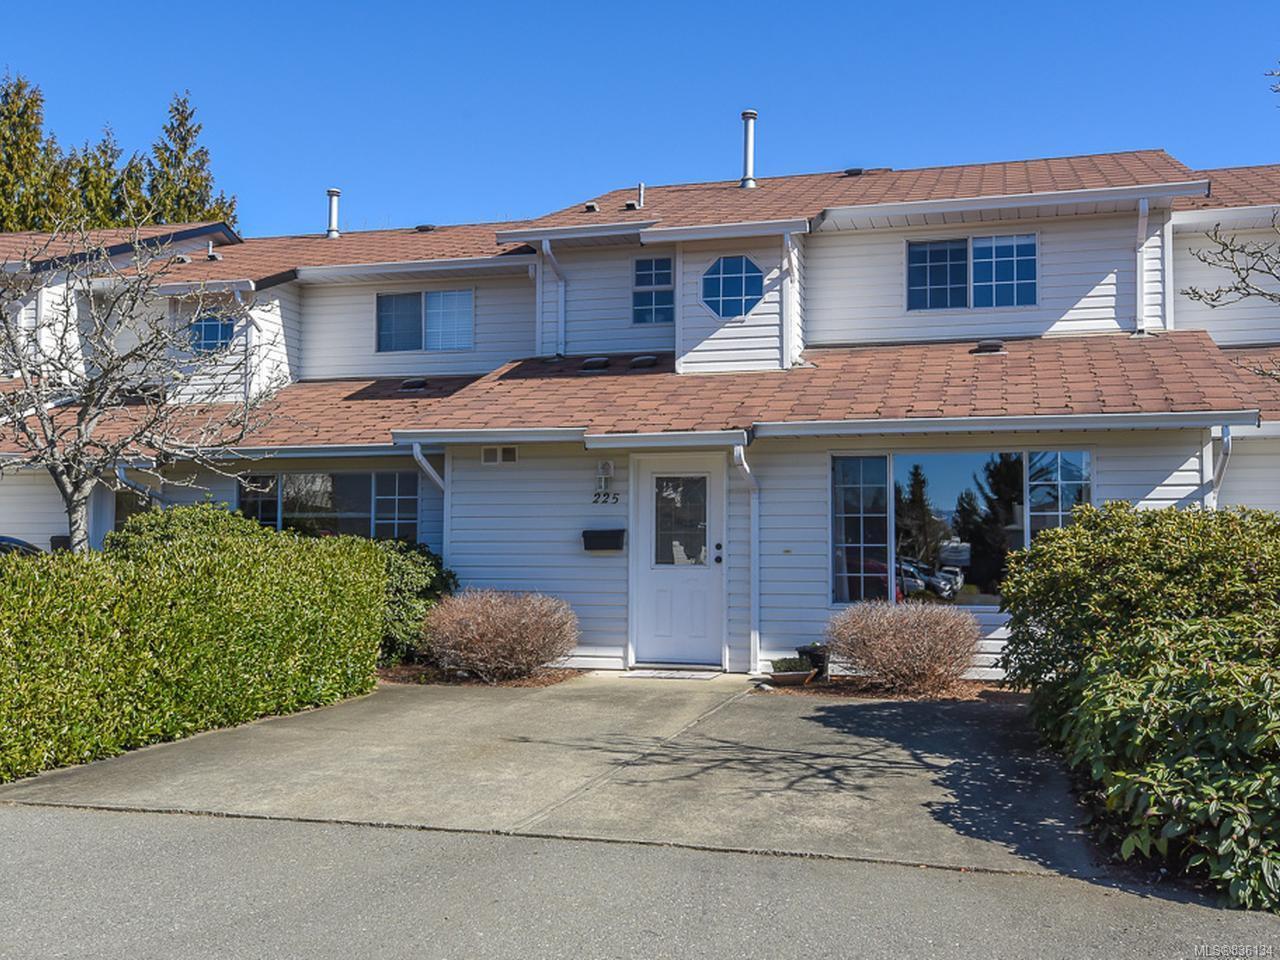 Main Photo: 225 680 Murrelet Dr in COMOX: CV Comox (Town of) Row/Townhouse for sale (Comox Valley)  : MLS®# 836134